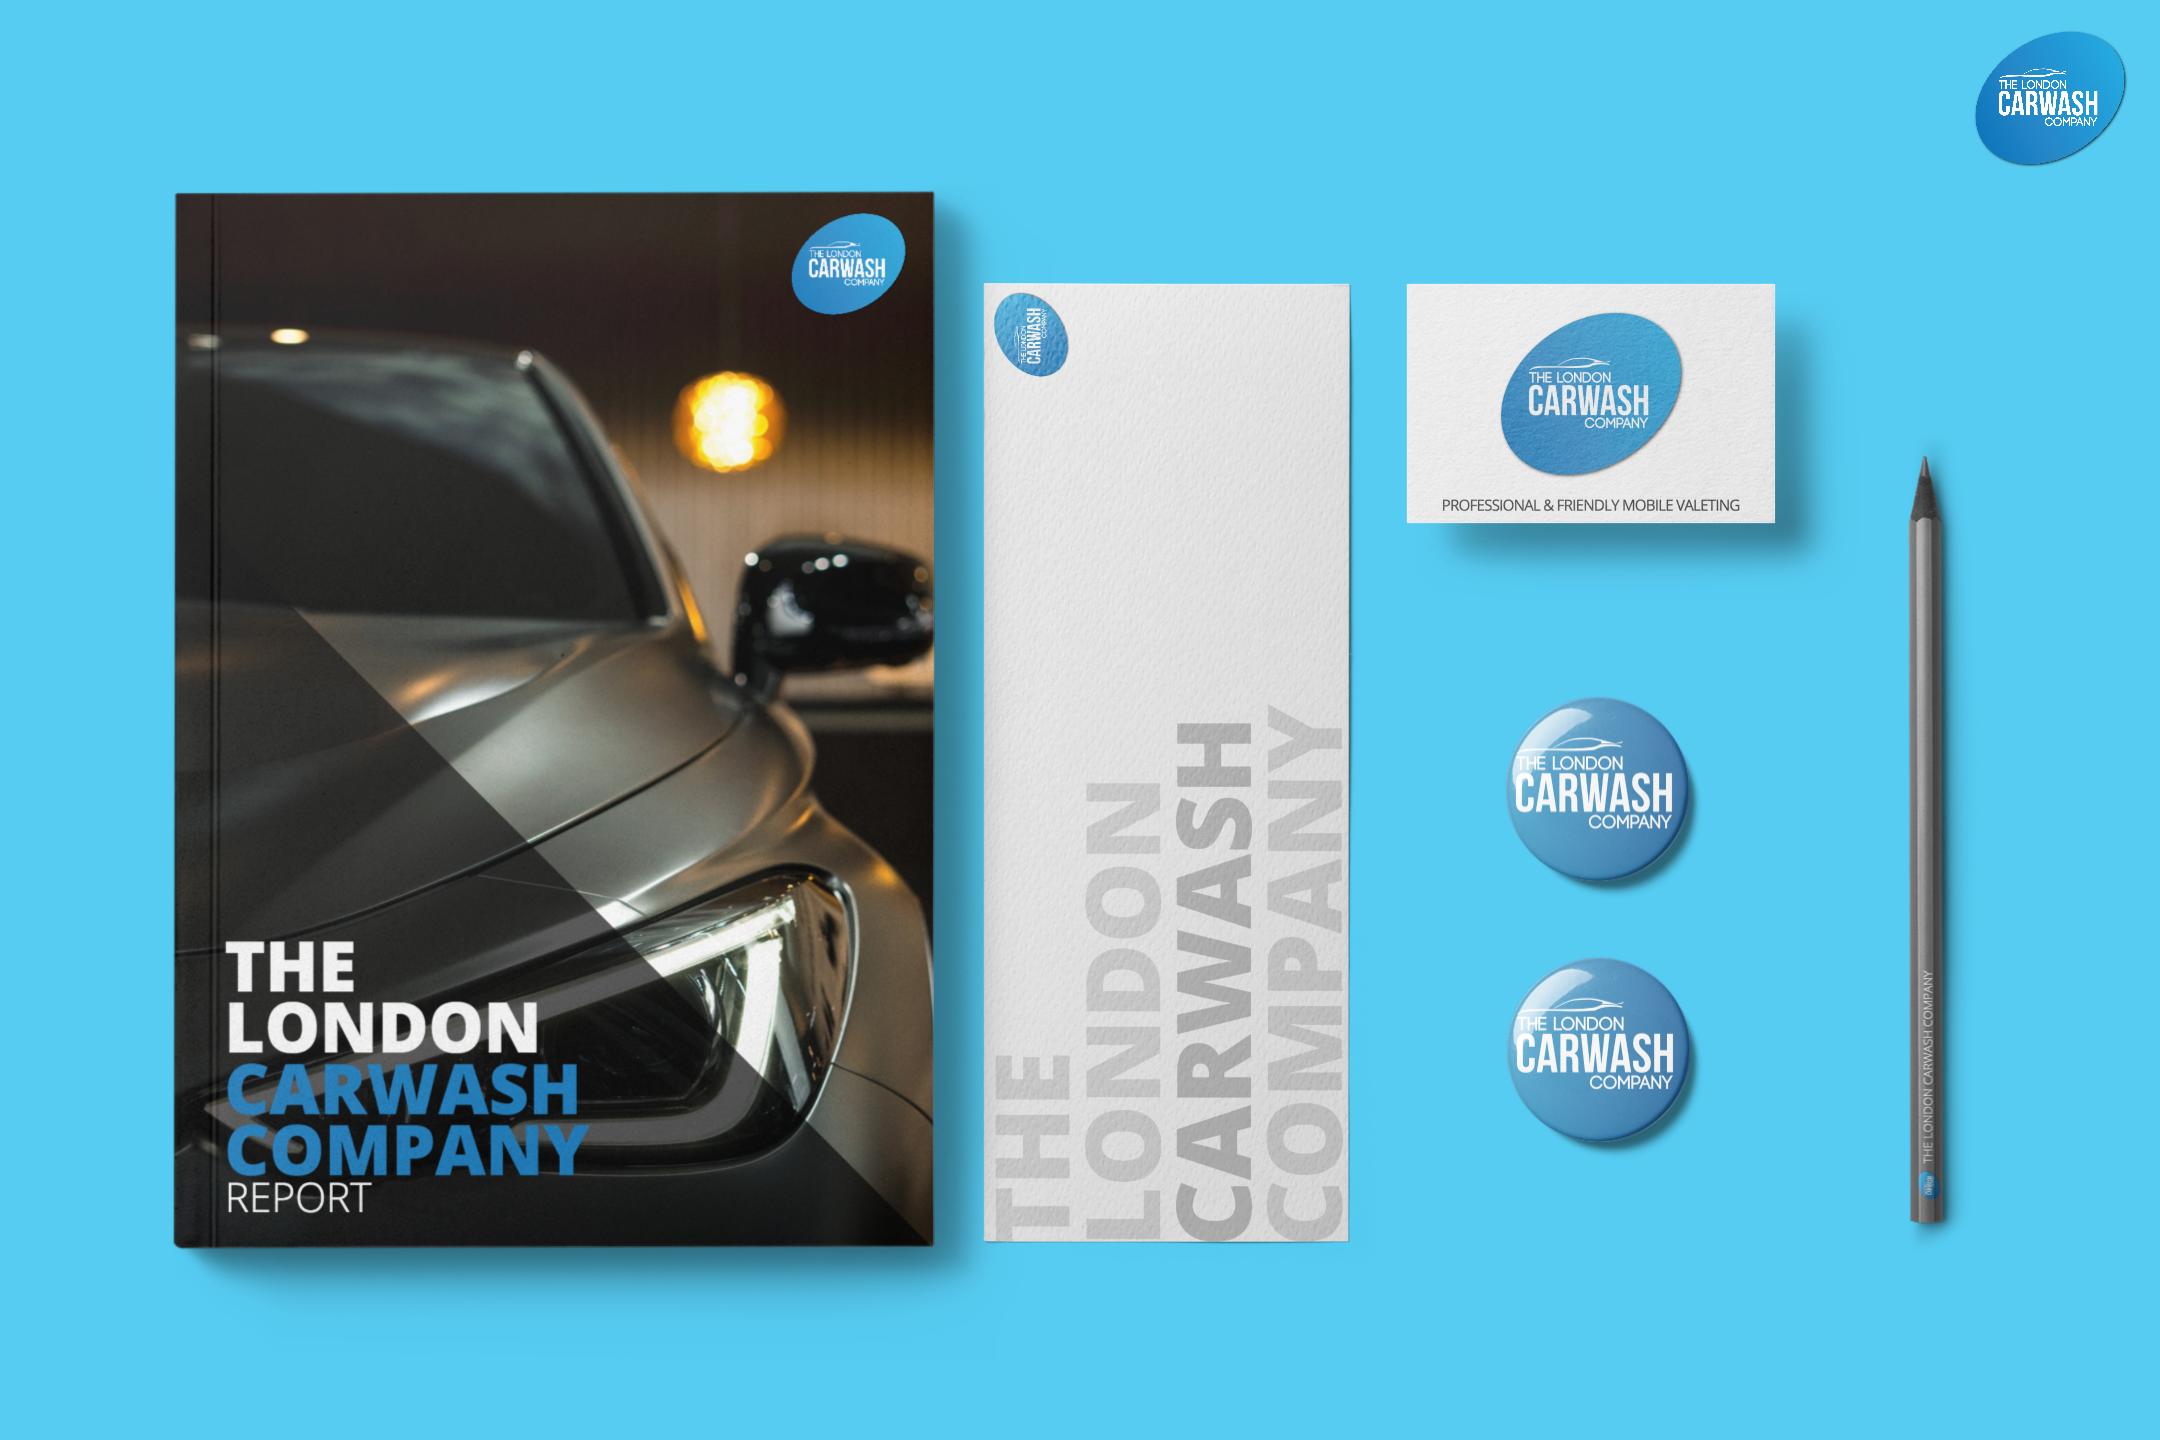 The London Carwash Company